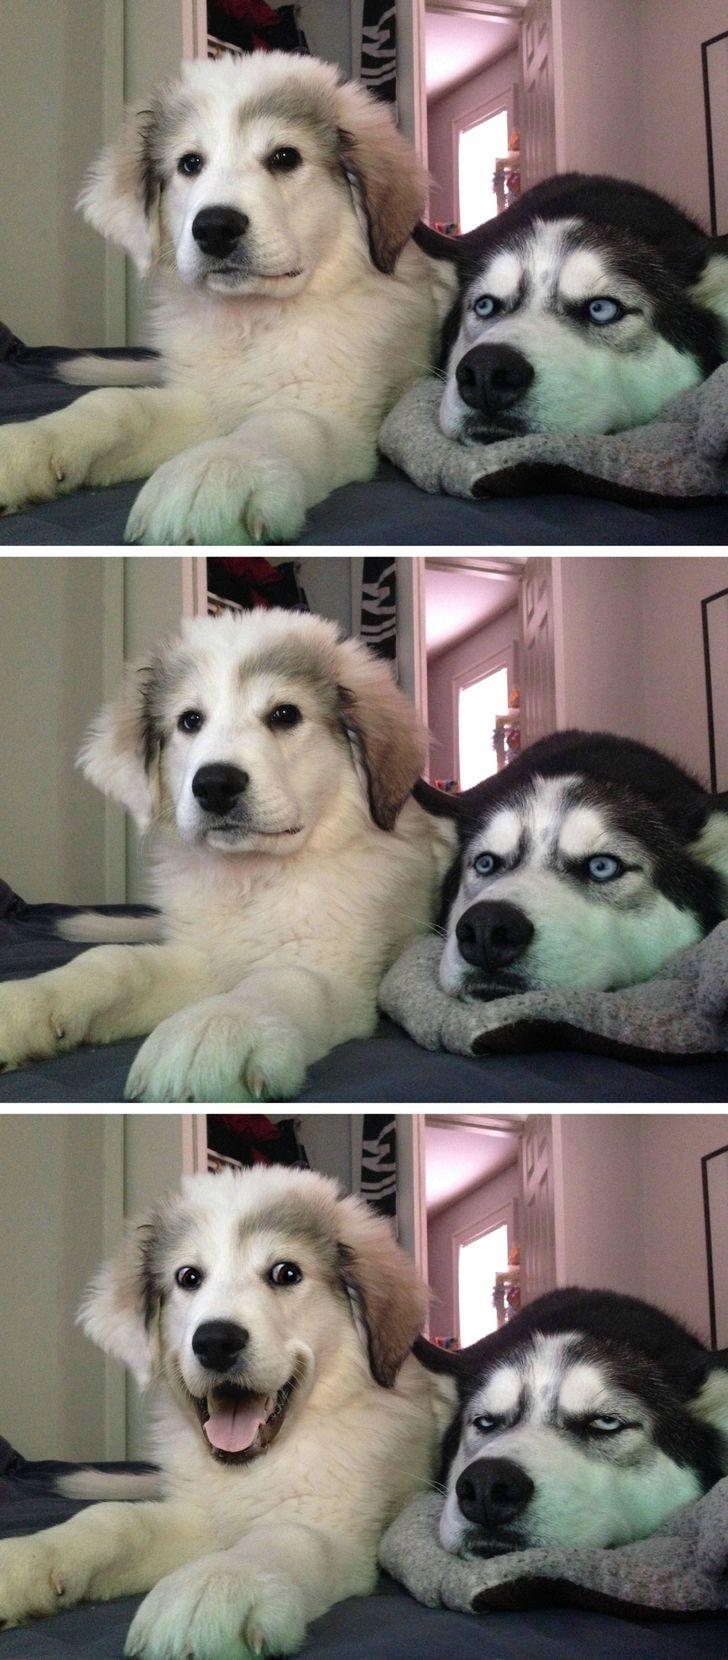 Husky Puppy Joke Template Dog jokes, Dog memes clean